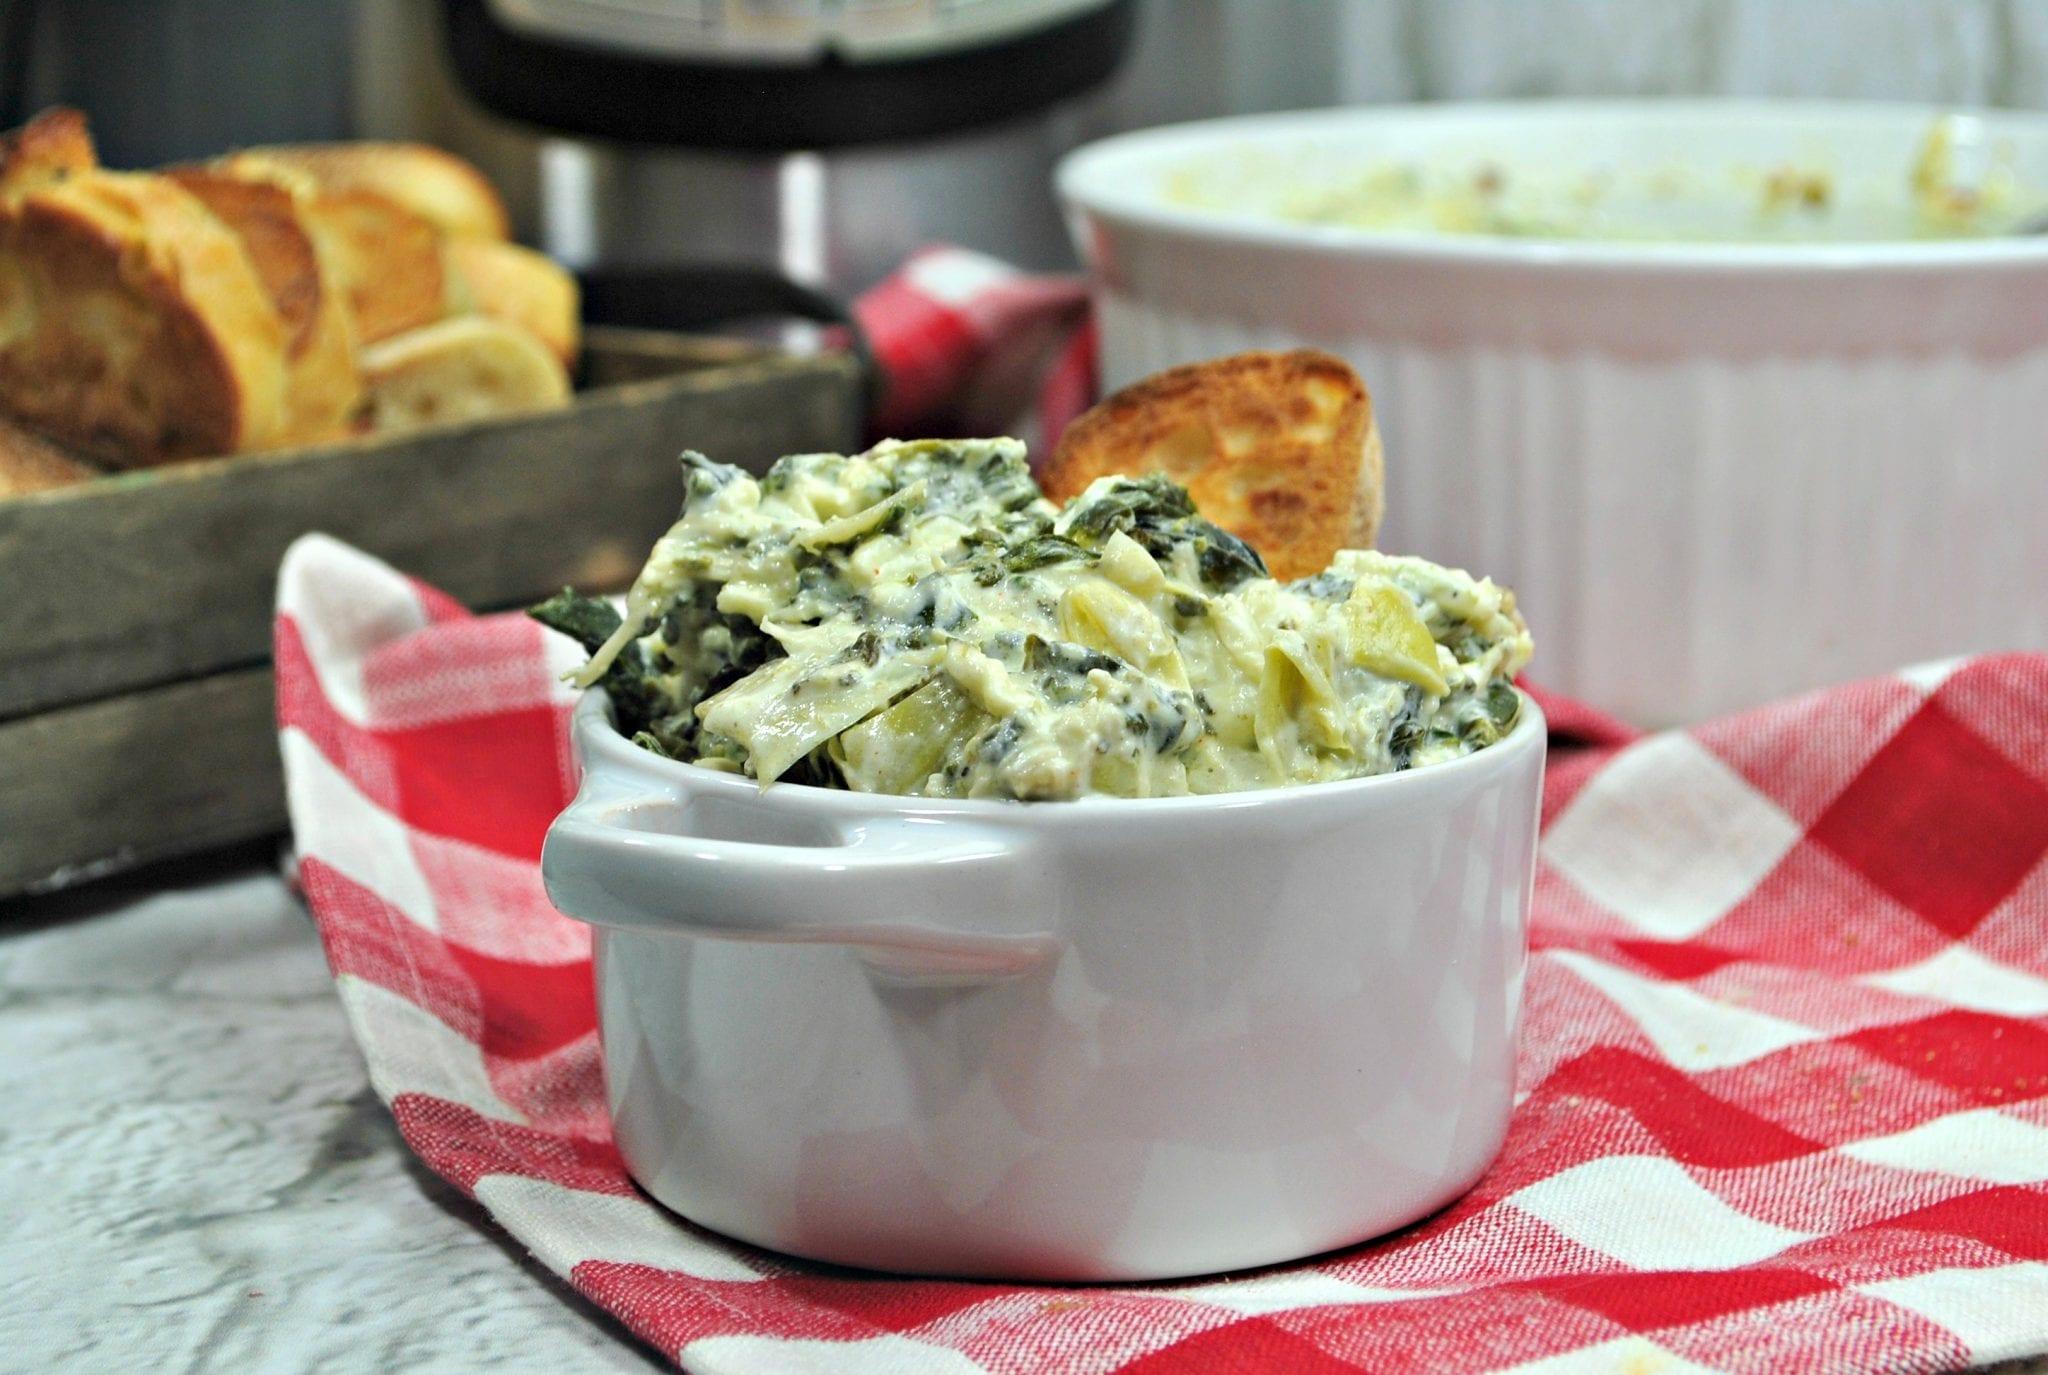 Instant Pot Spinach Artichoke Dip recipe - enjoy.